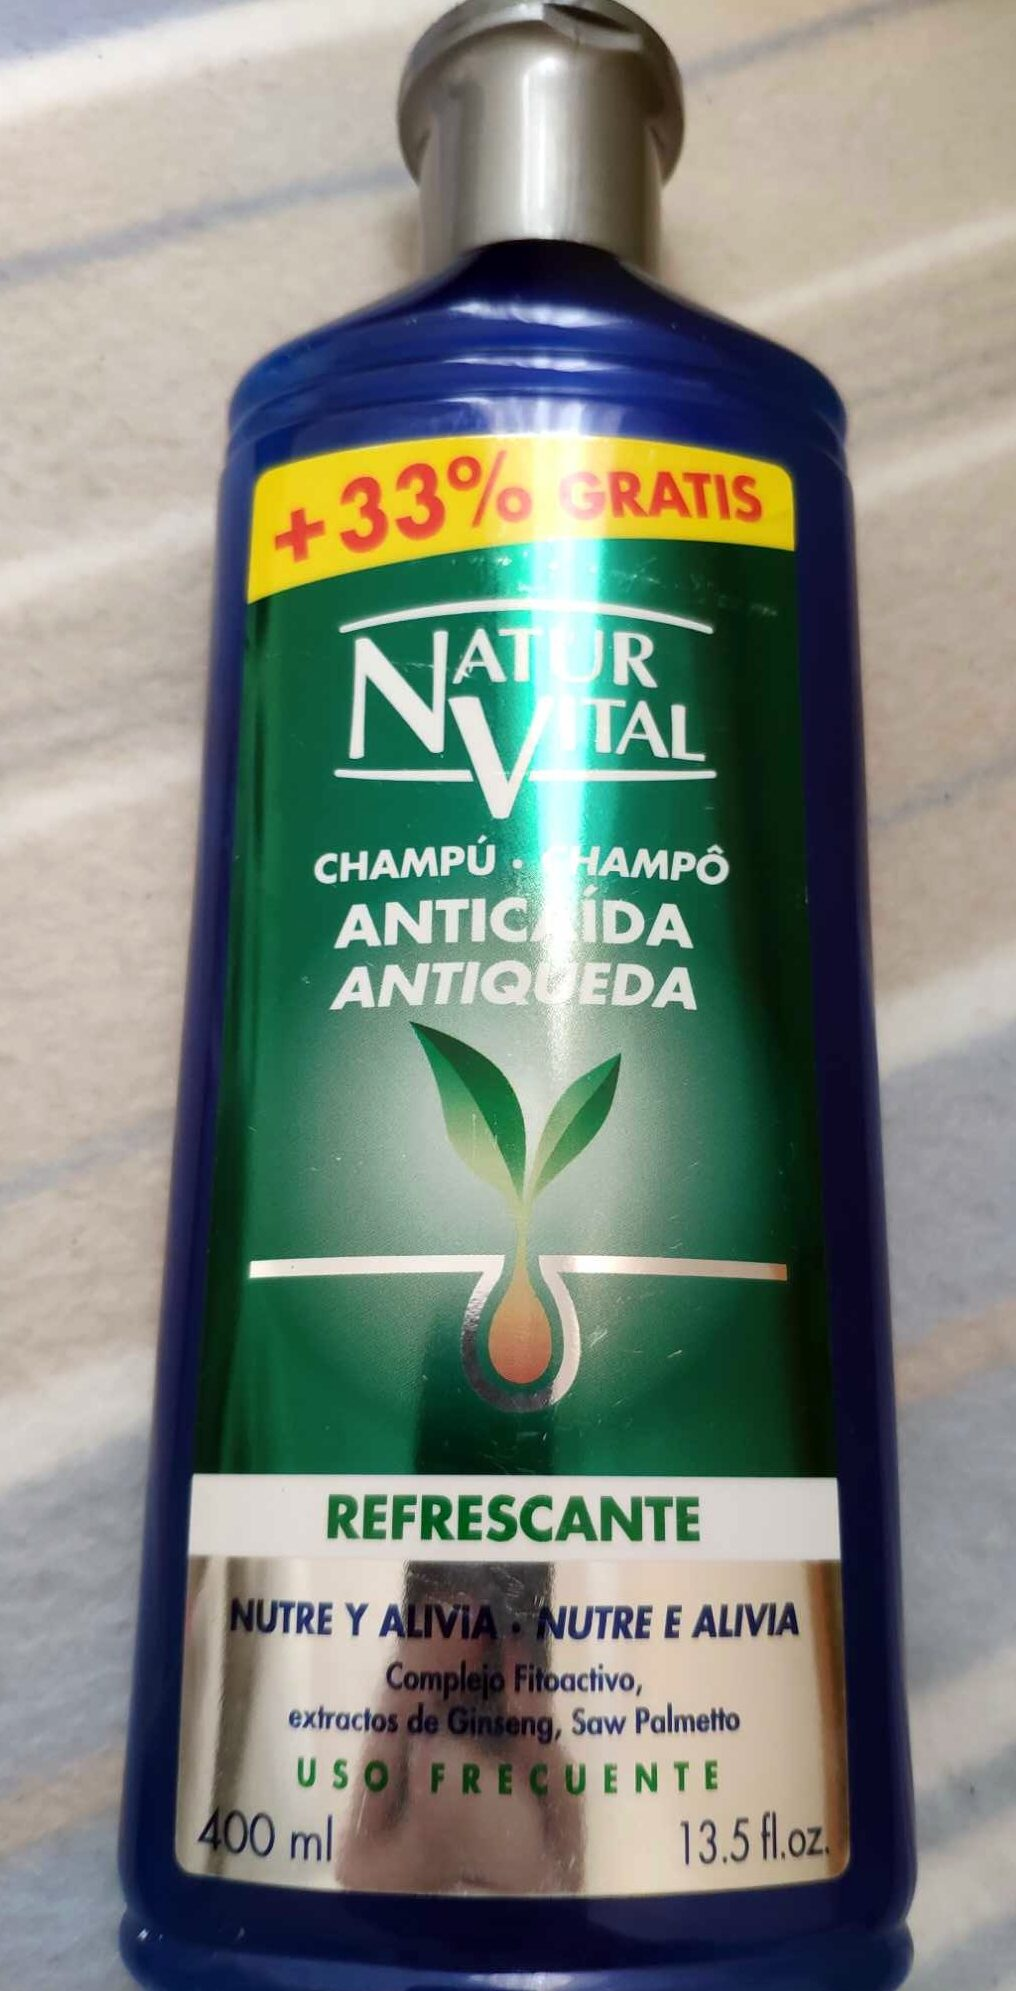 Champú anticaída Refrescante - Product - en